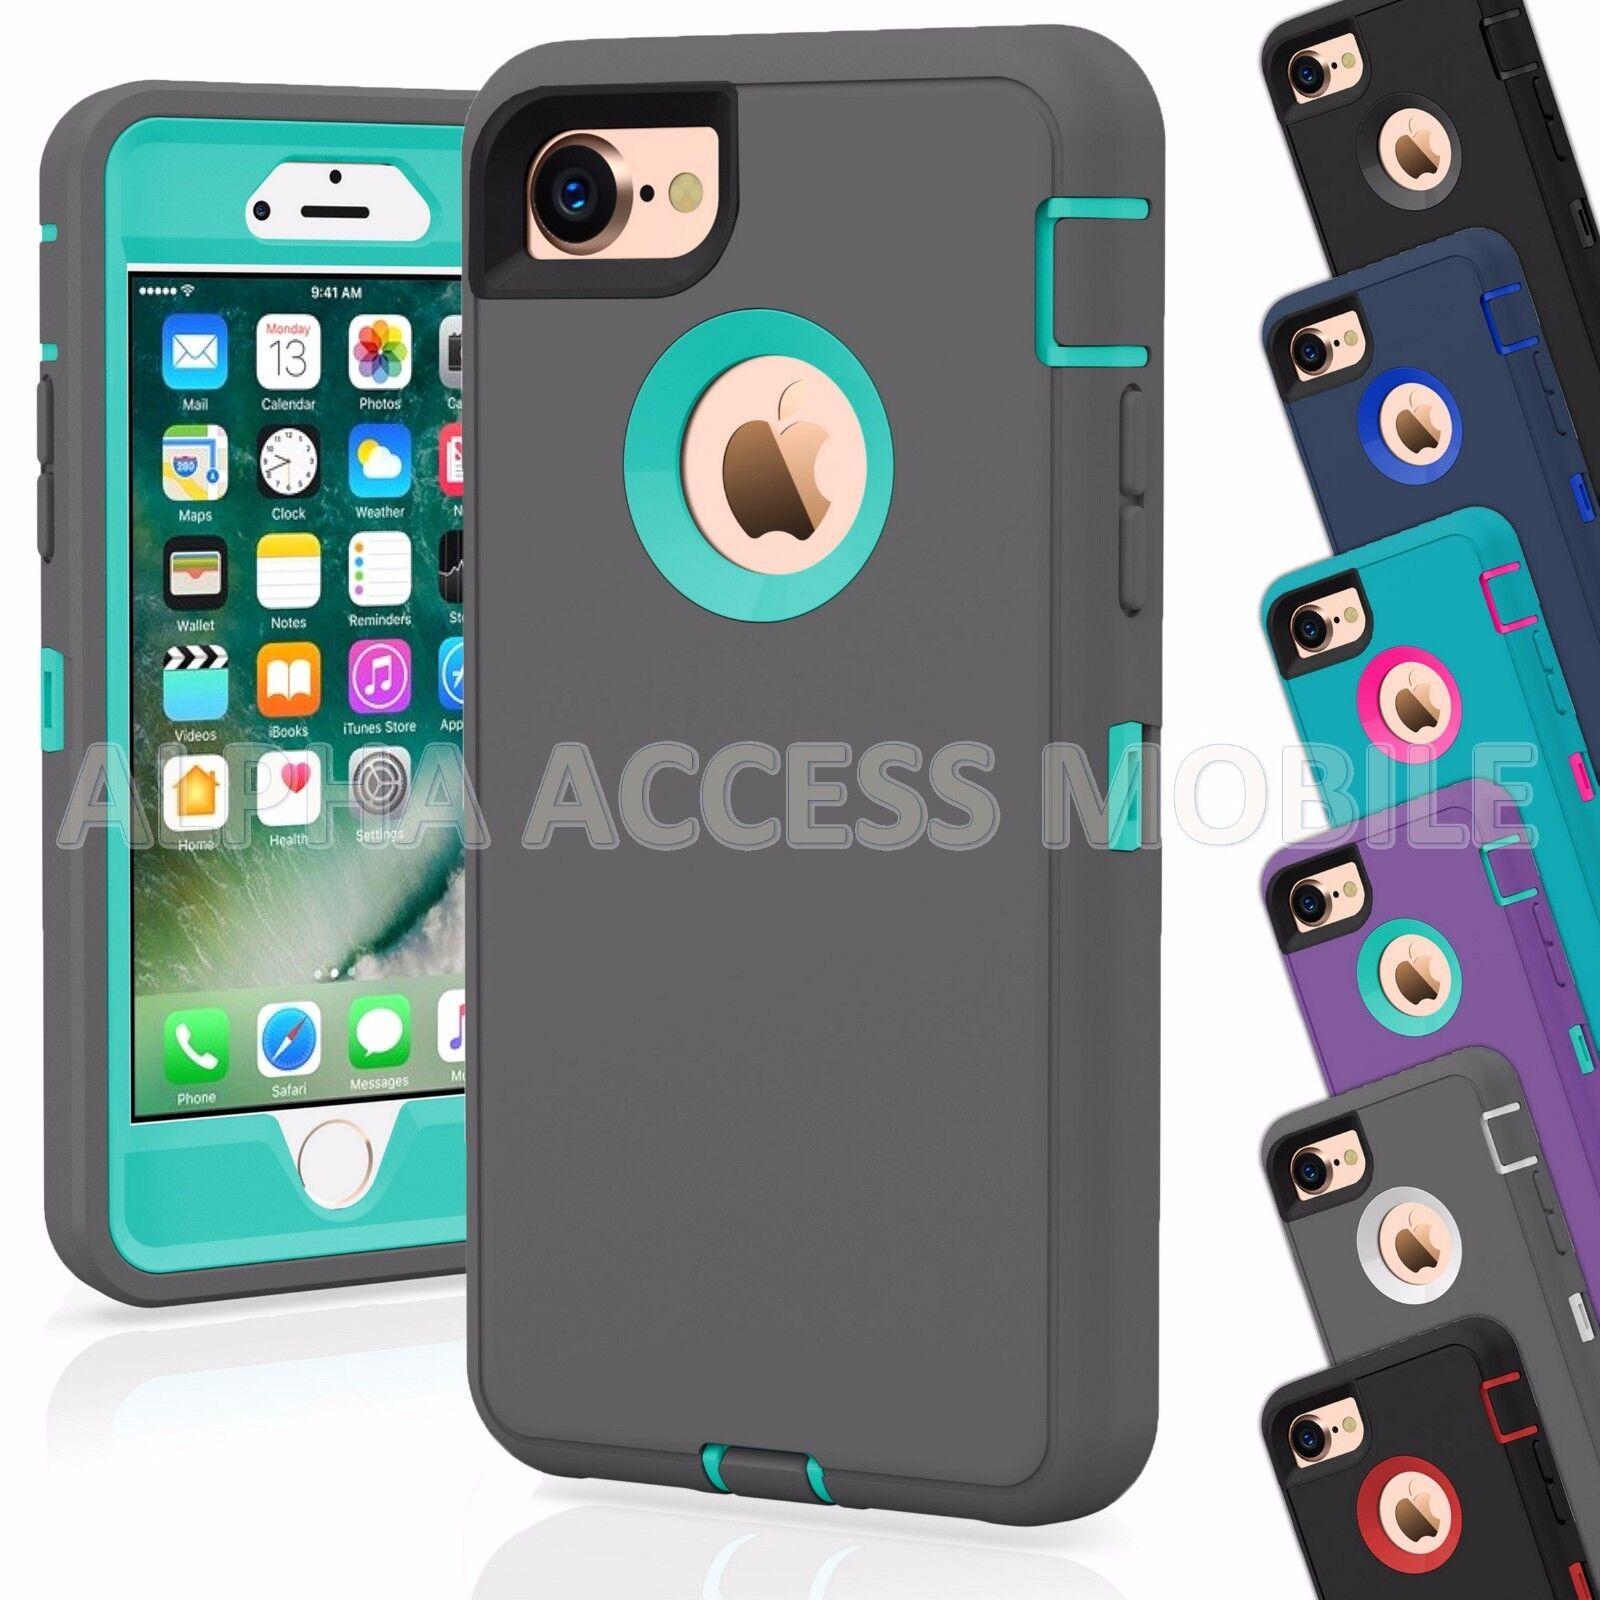 12 tpu shockproof defender hybrid case wholesale lot for apple12 piece wholesale lot for apple iphone 7 plus